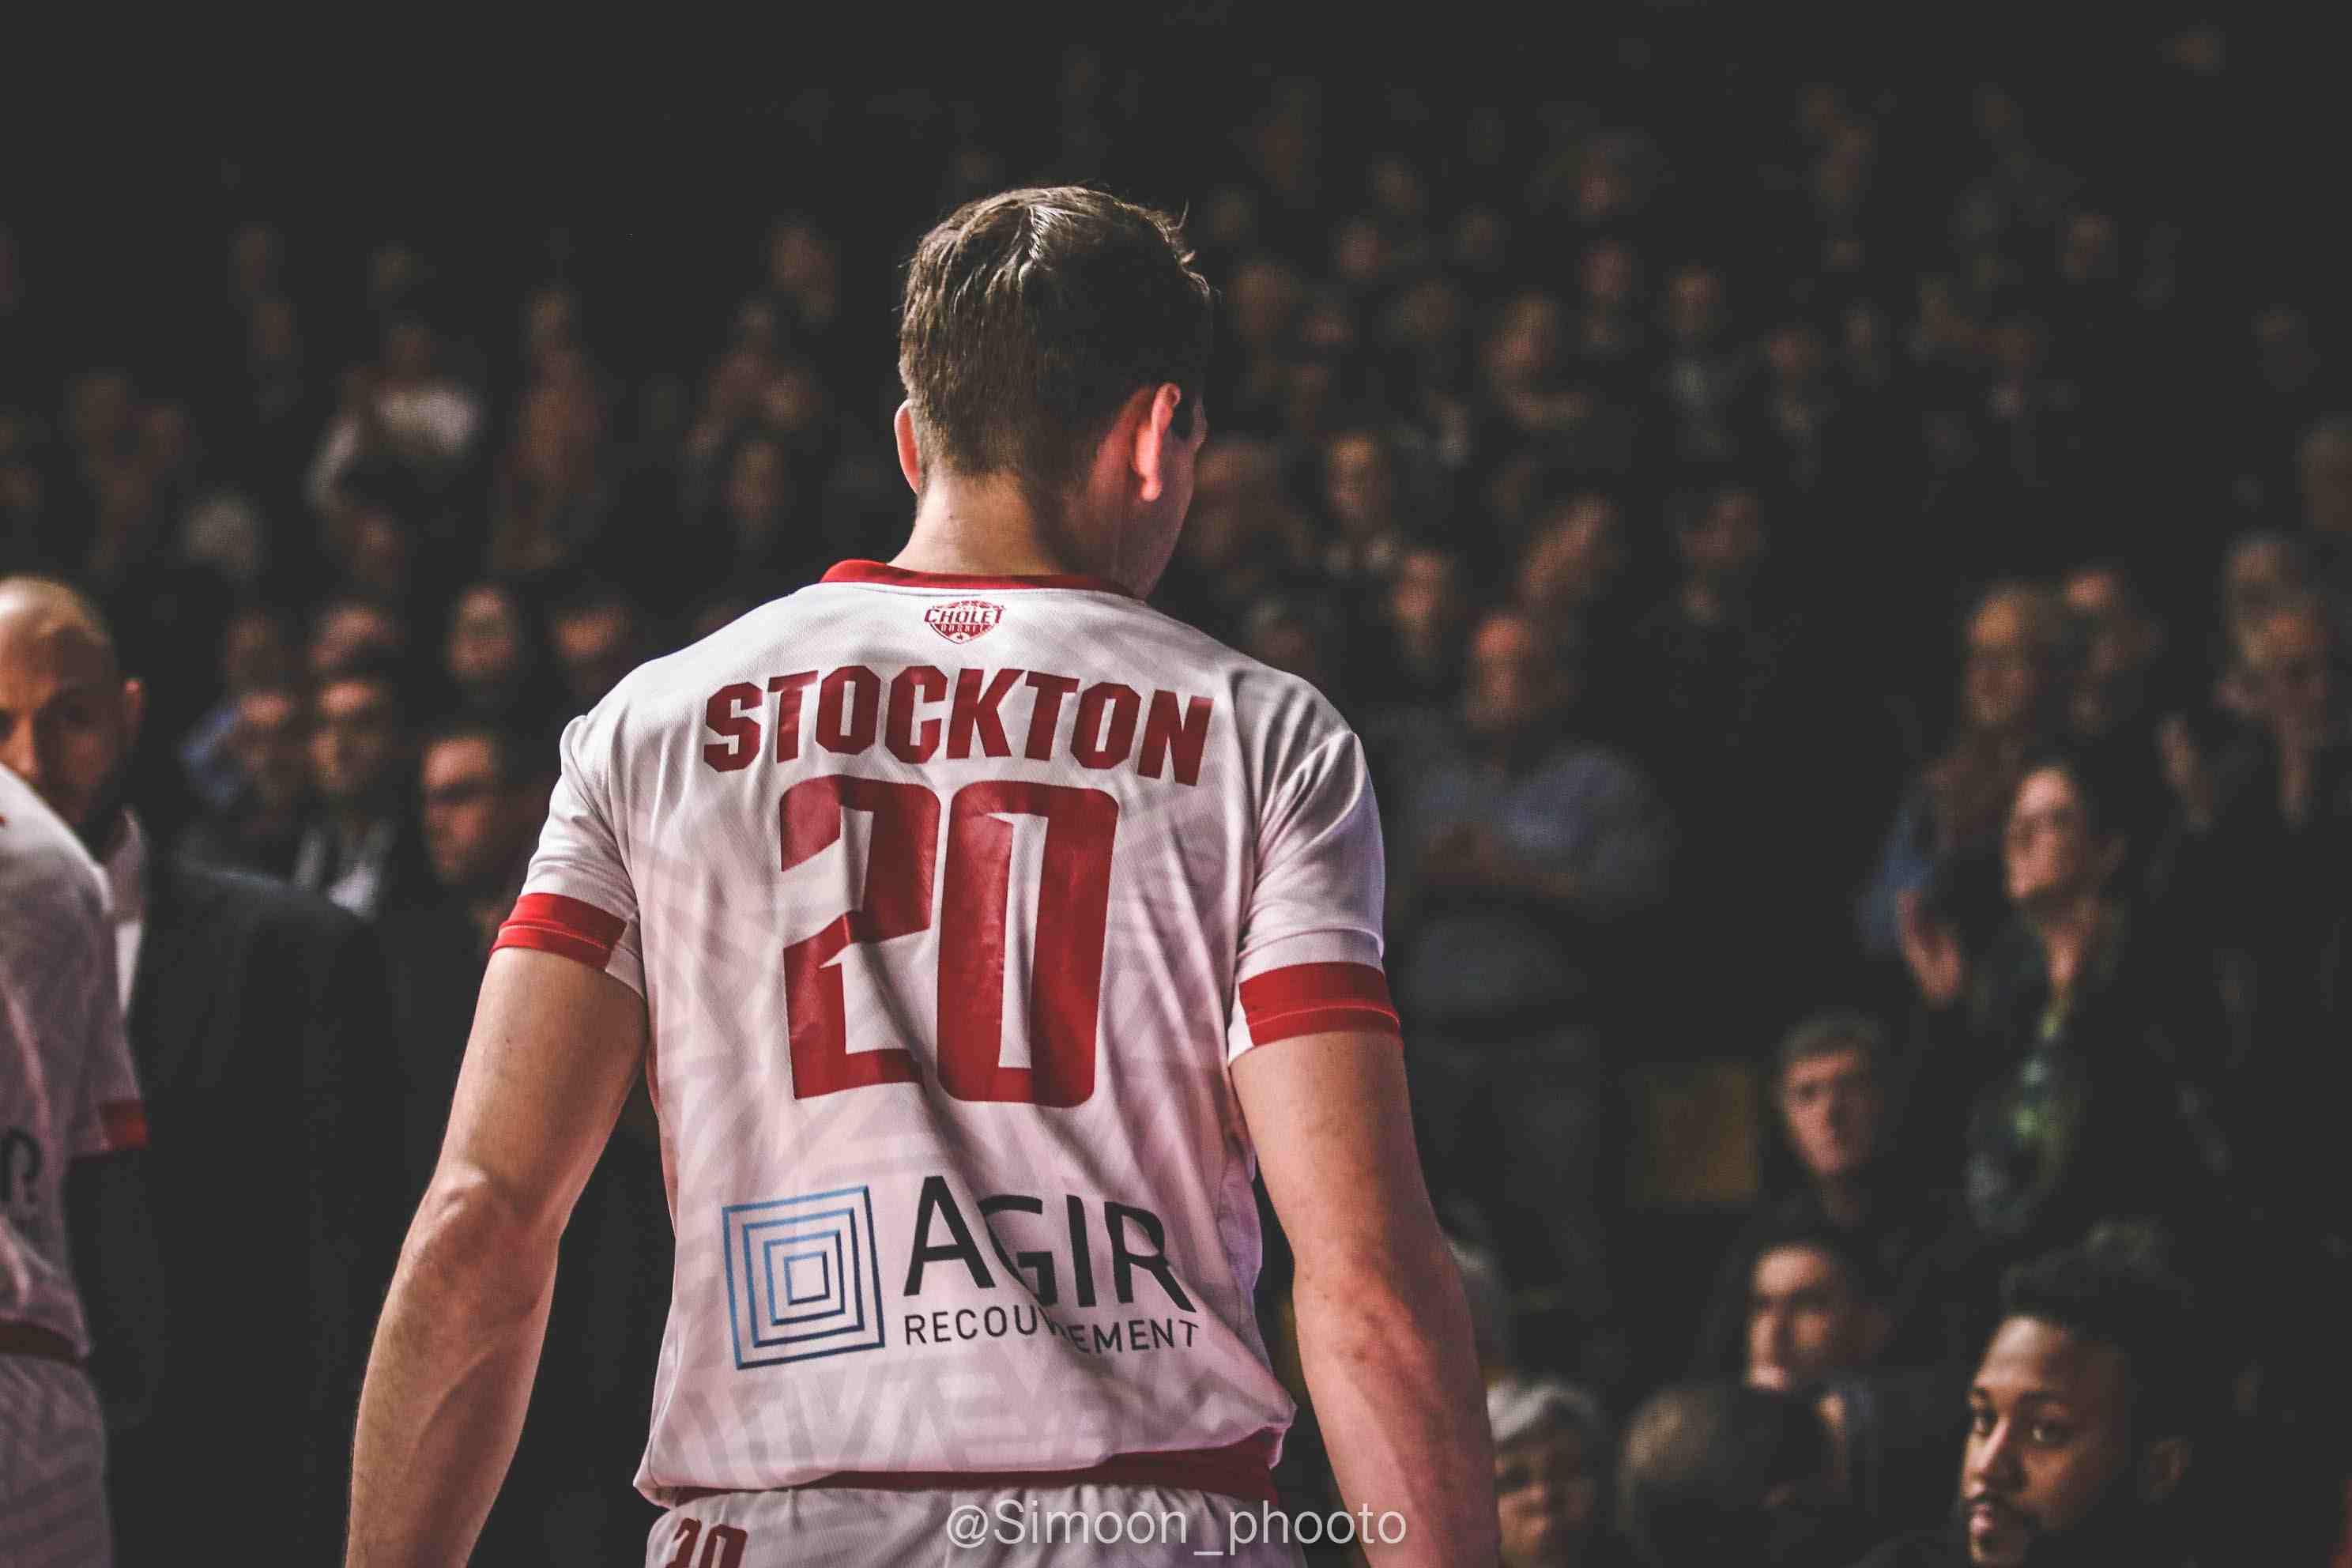 Michael Stockton - © Simon Godet